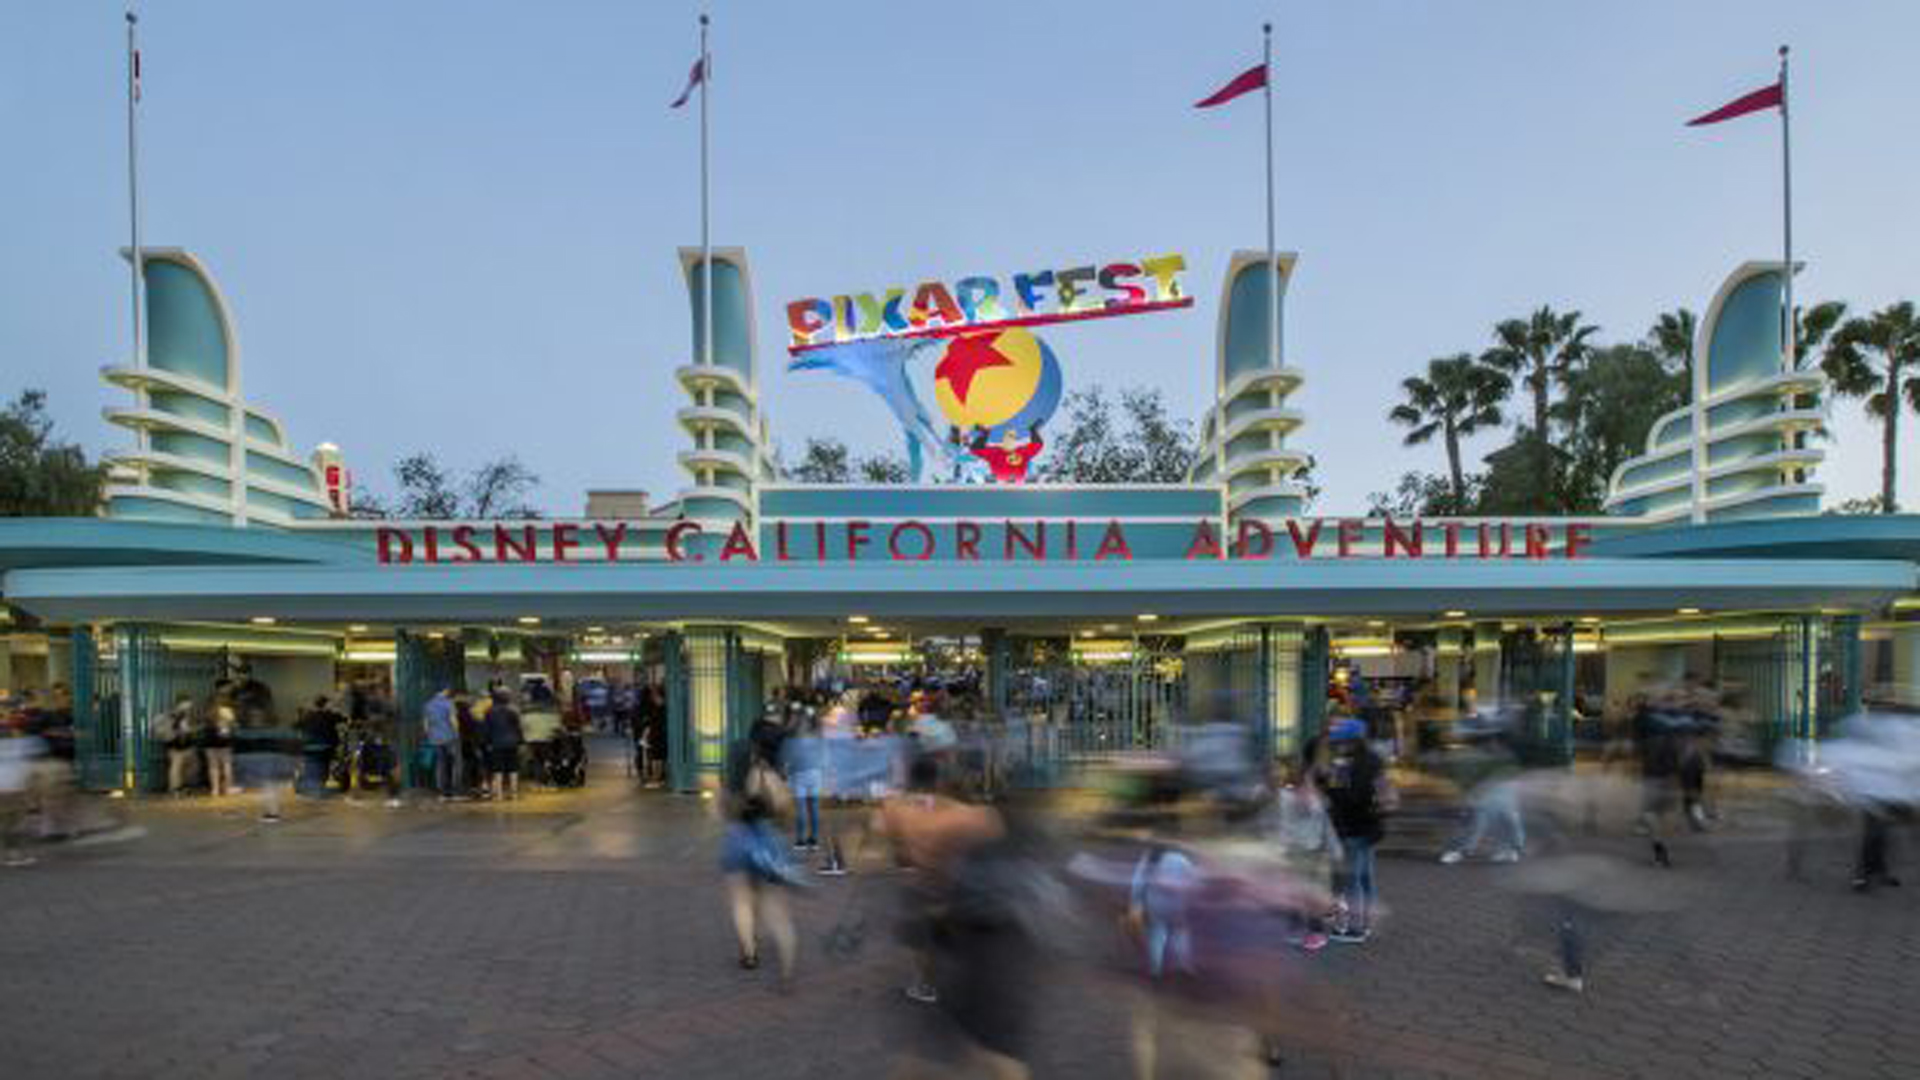 The Disney California Adventure entrance. (Credit: Disney)